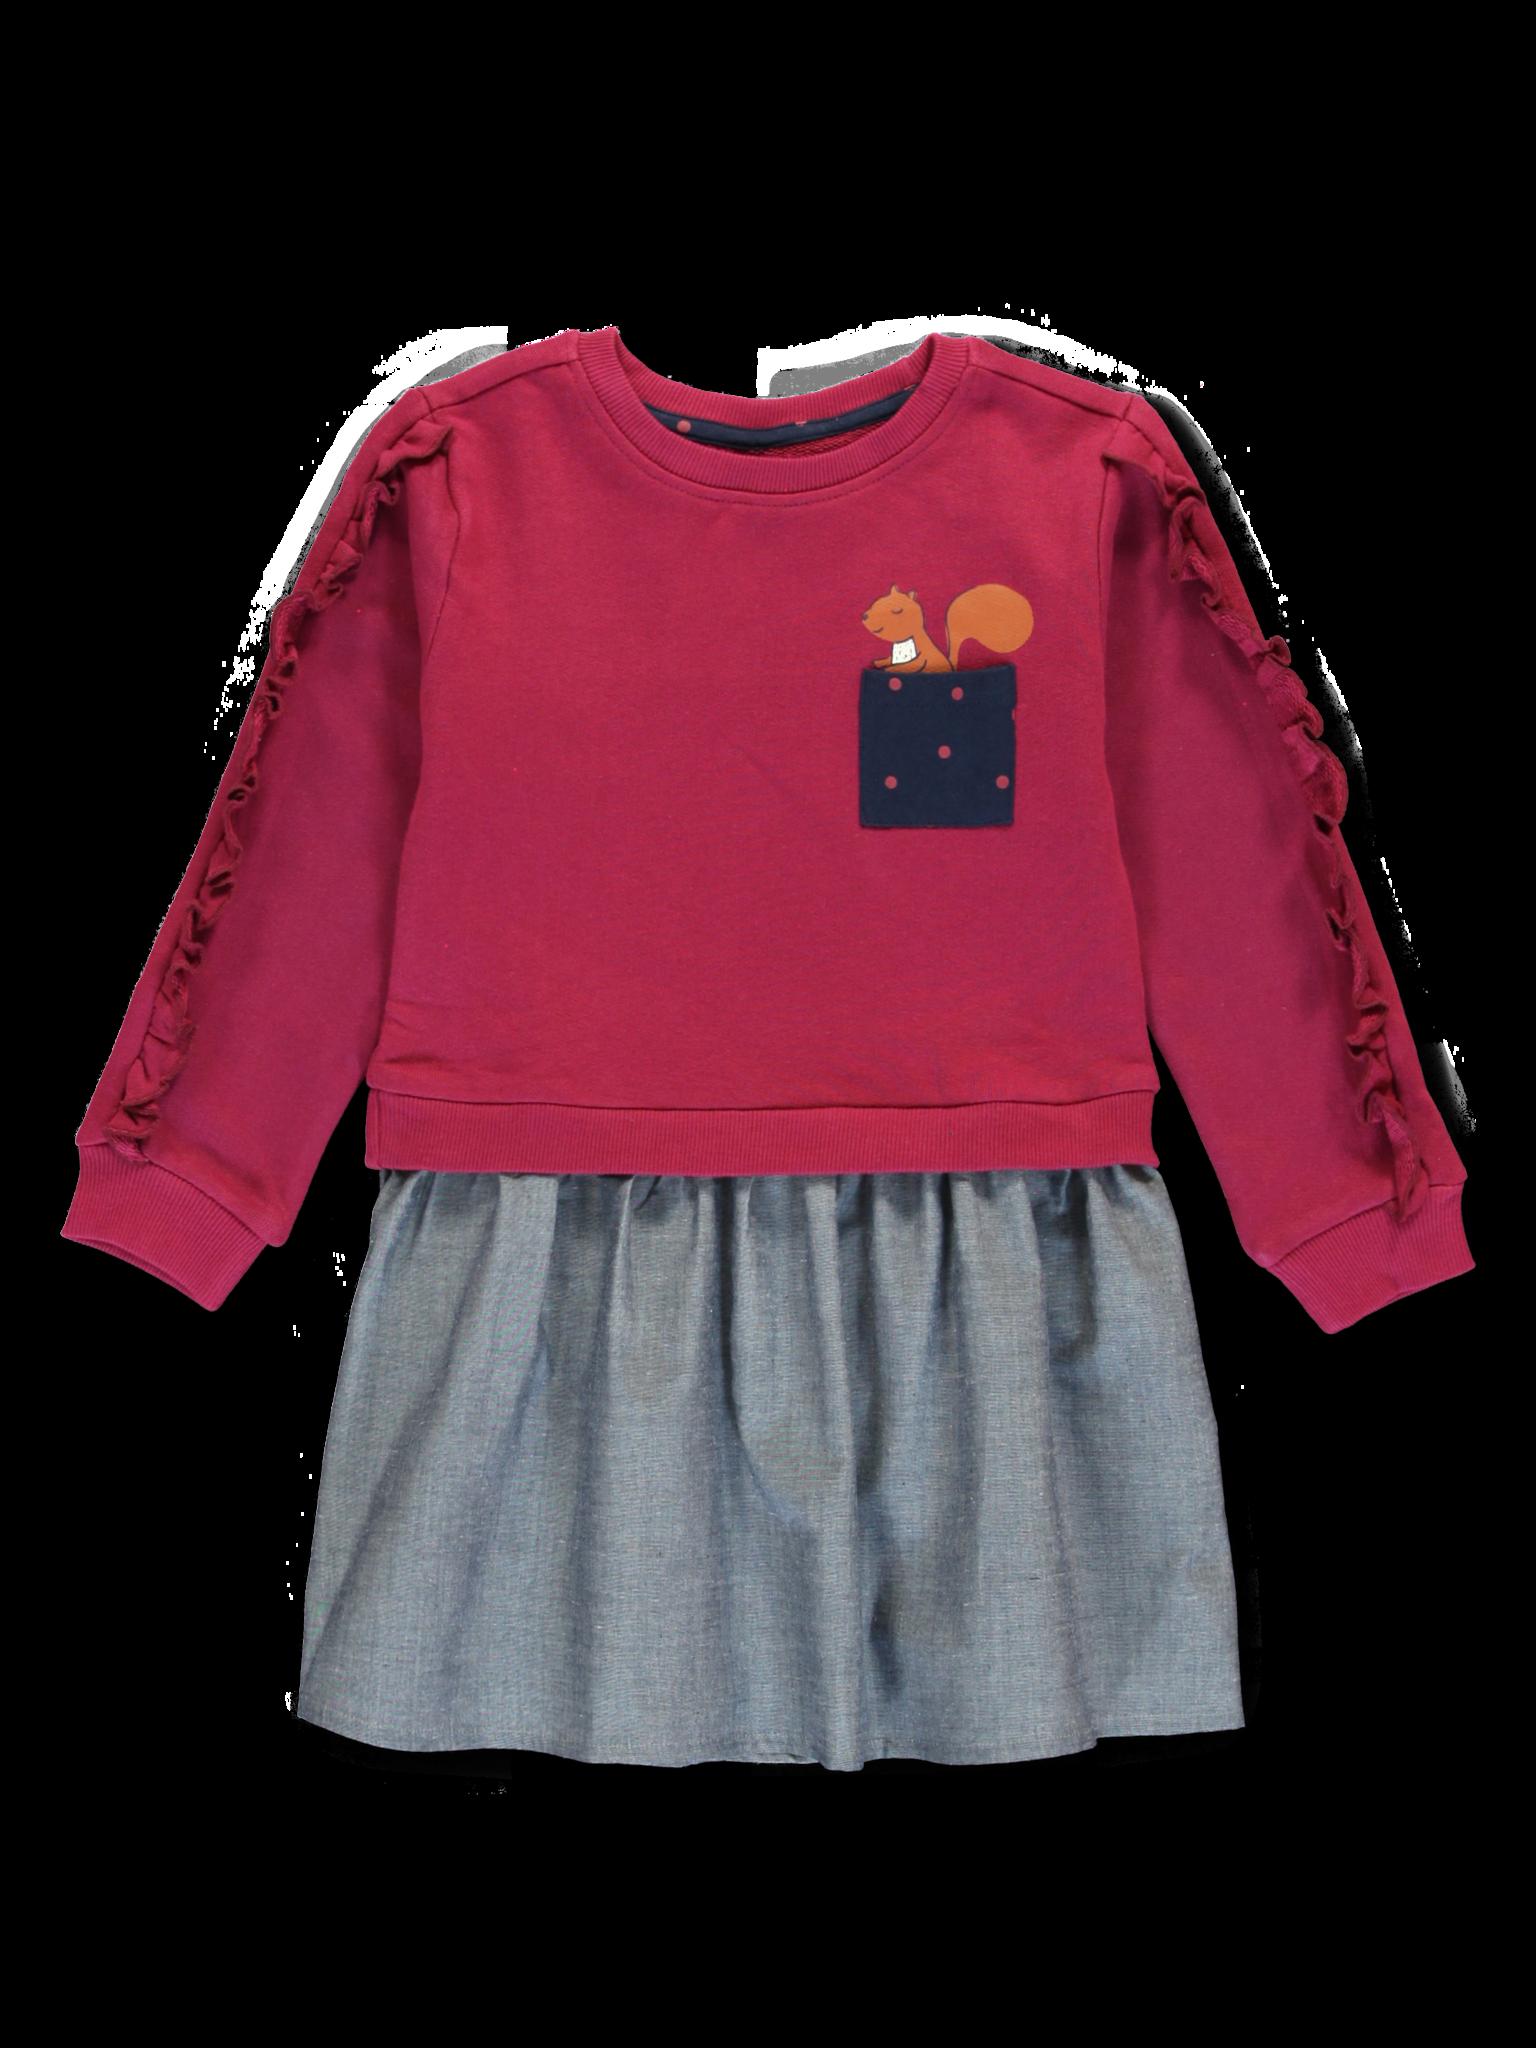 All Brands   Winterproducts Small Girls   Dress   12 pcs/box